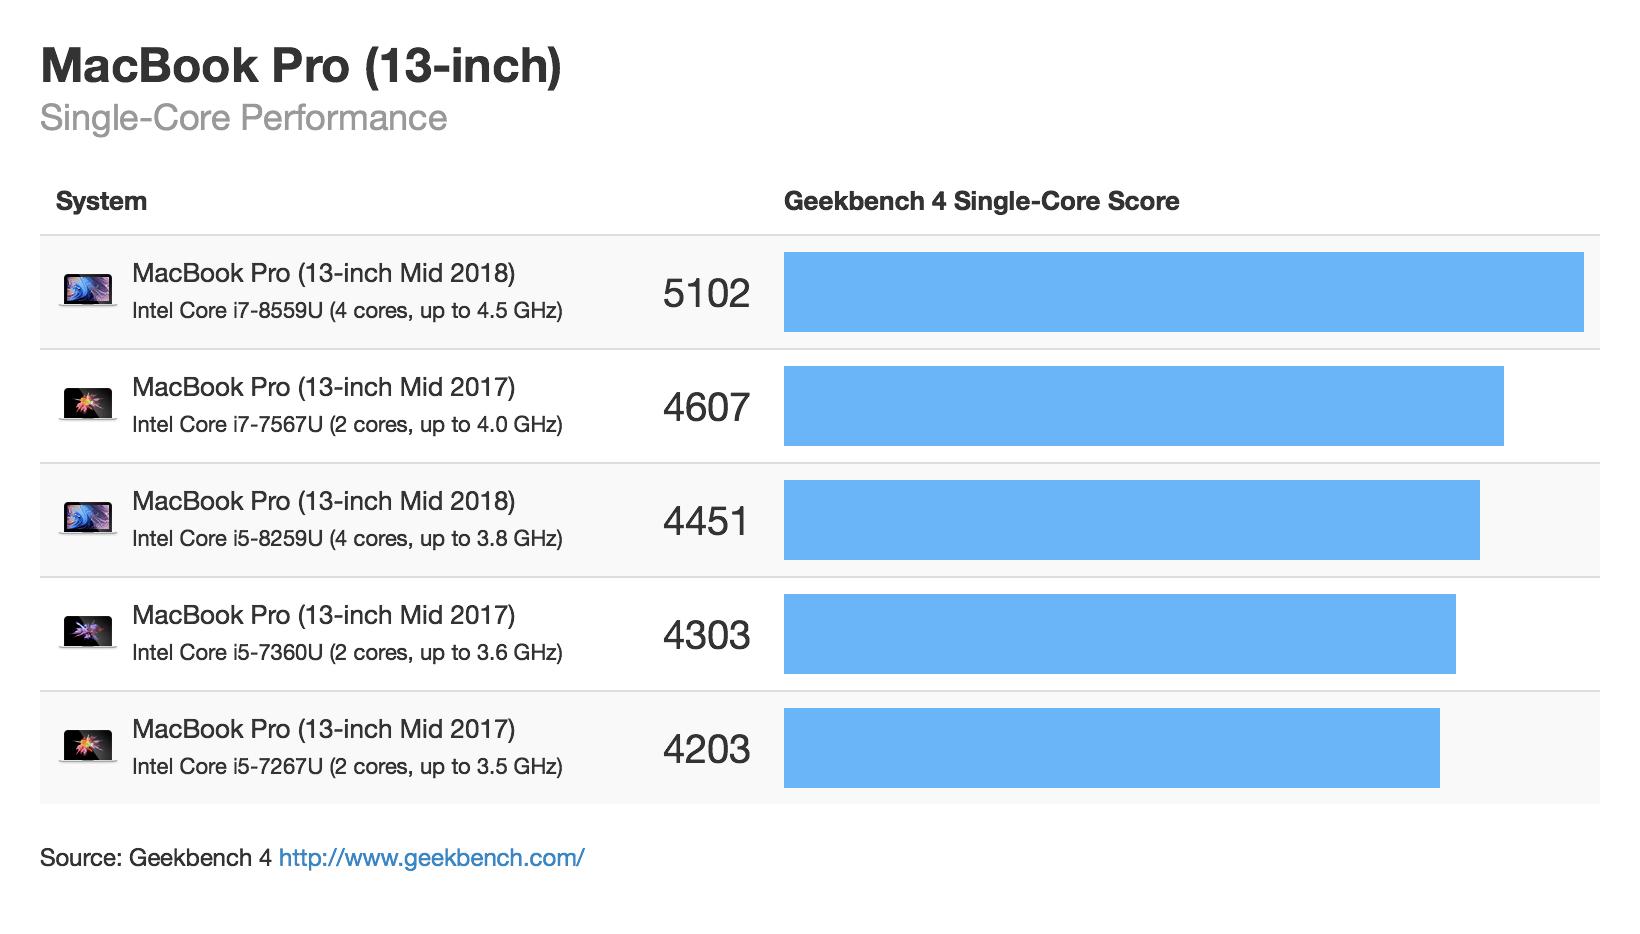 Macbook Pro 13 Mid 2018 Singlecore